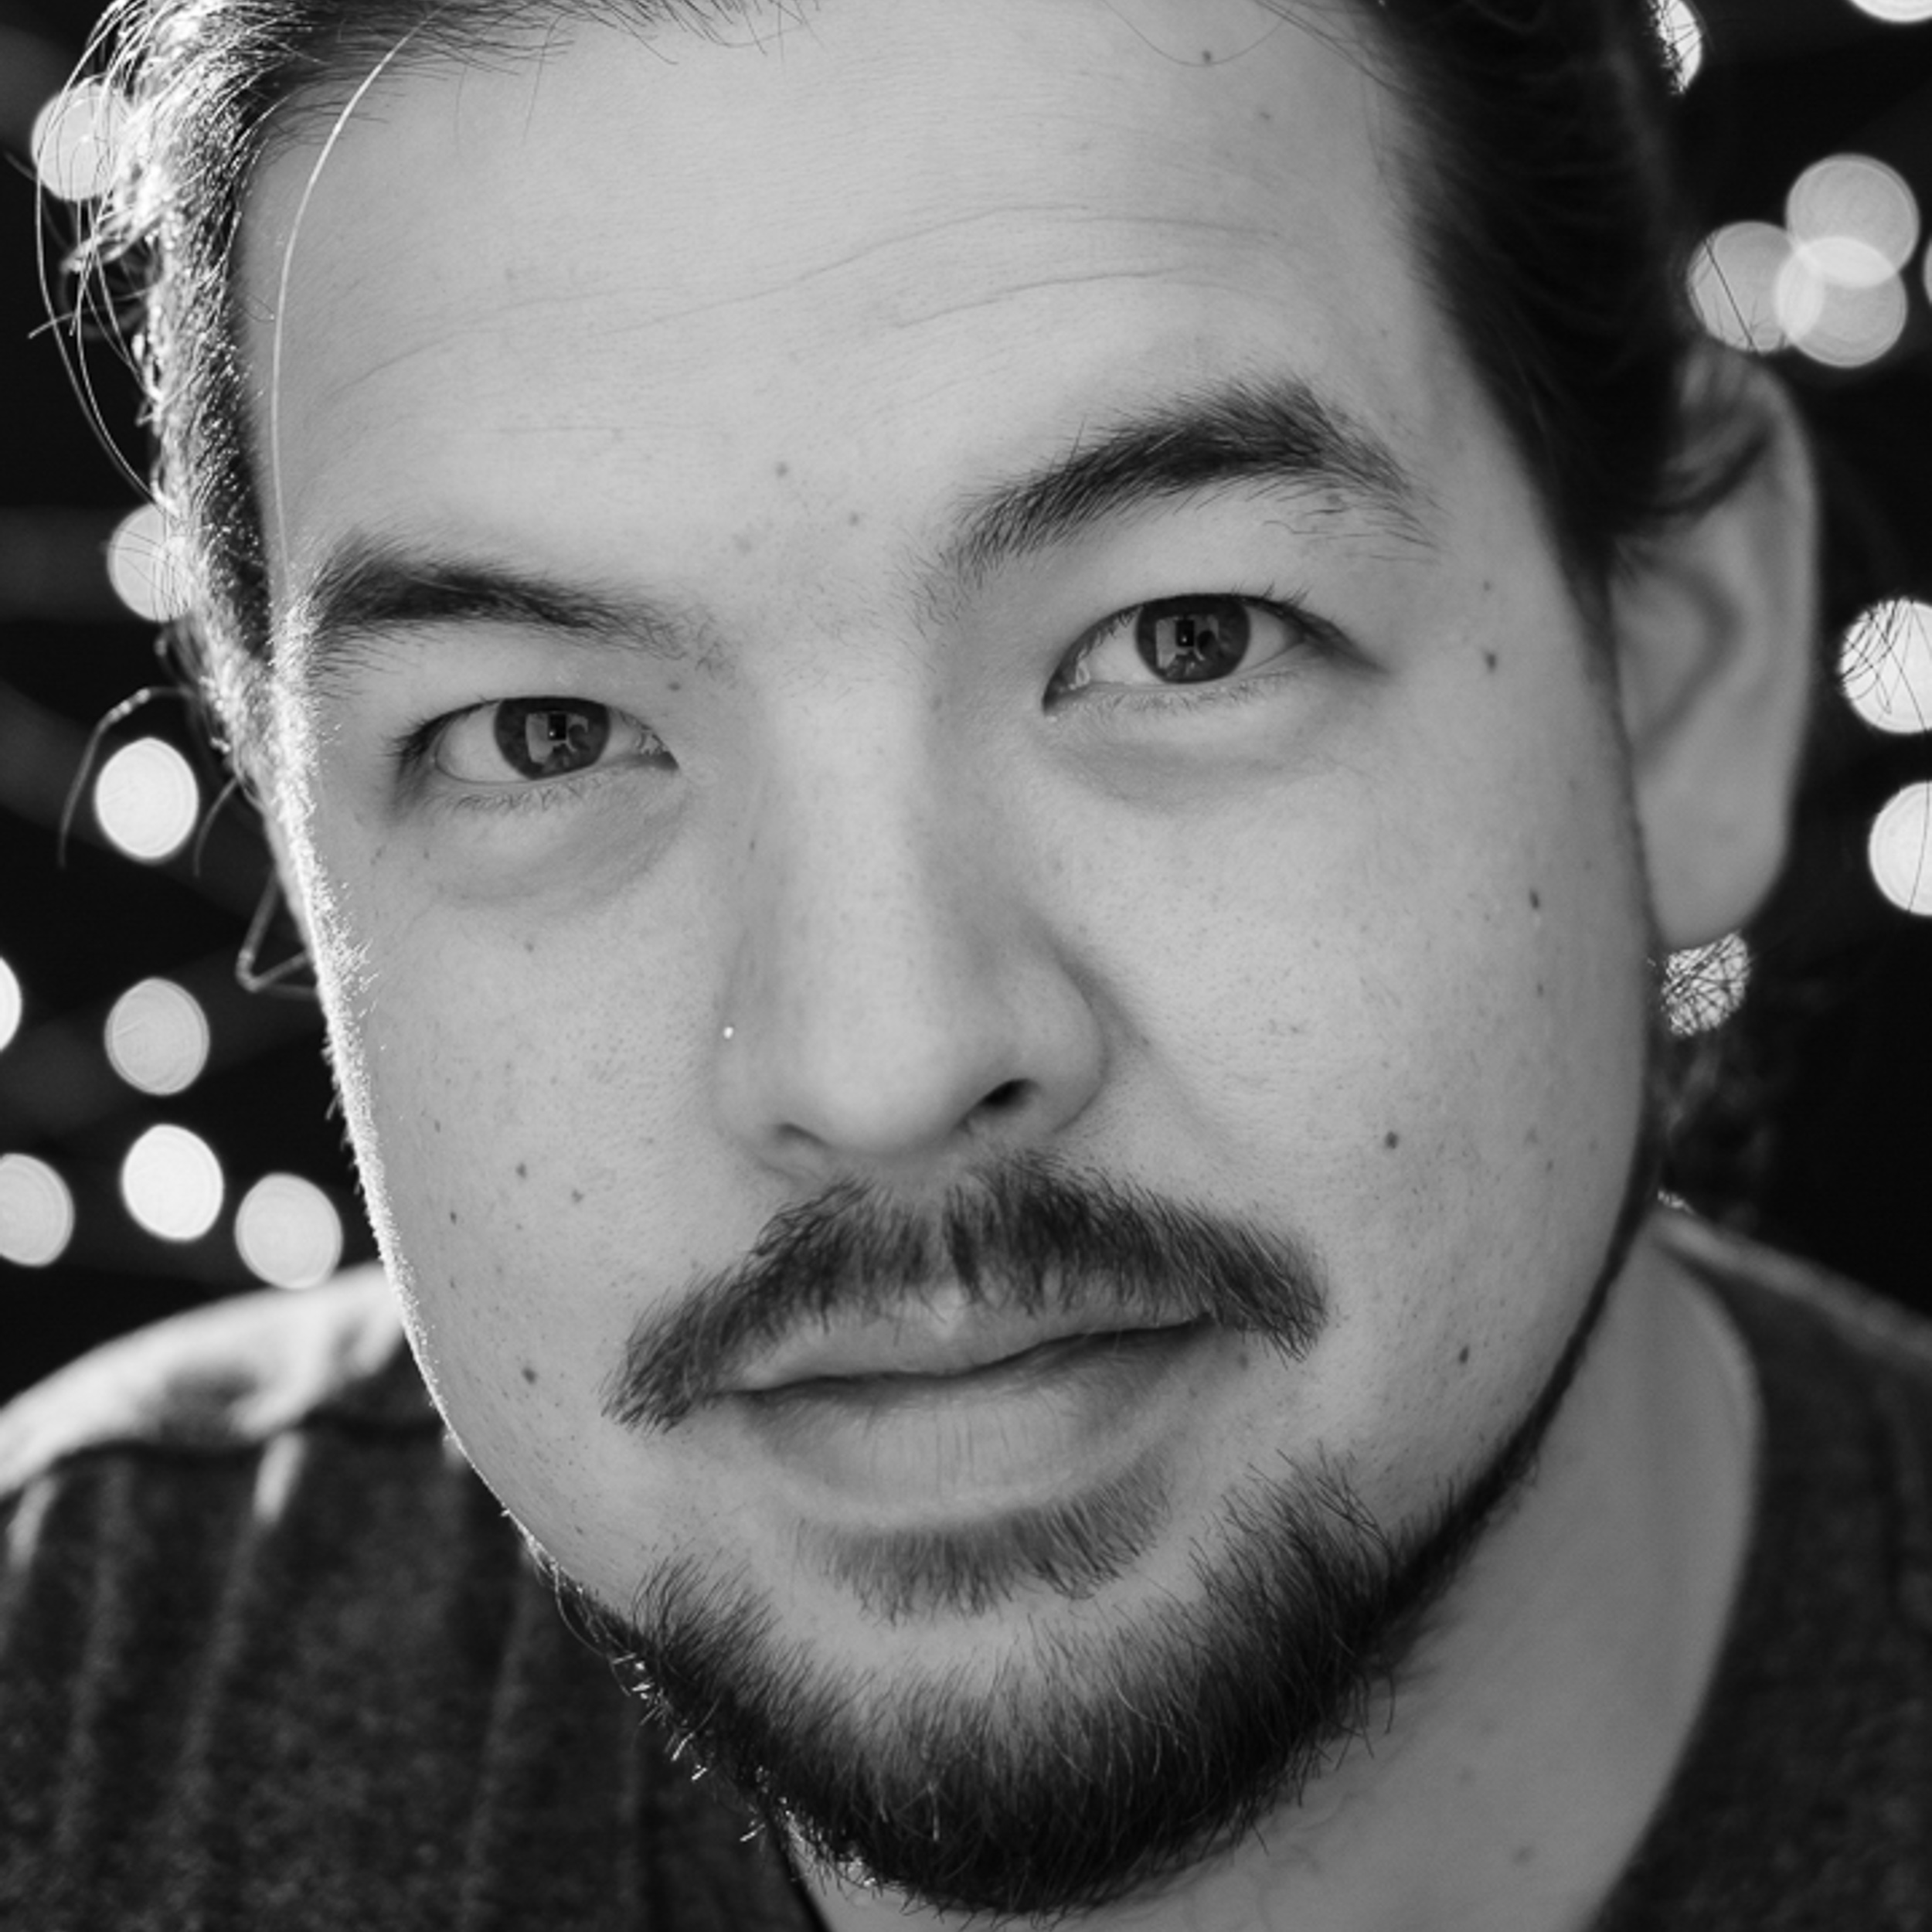 — Ryan Tonegawa - Lead Photographer, Owner, Origami Enthusiast